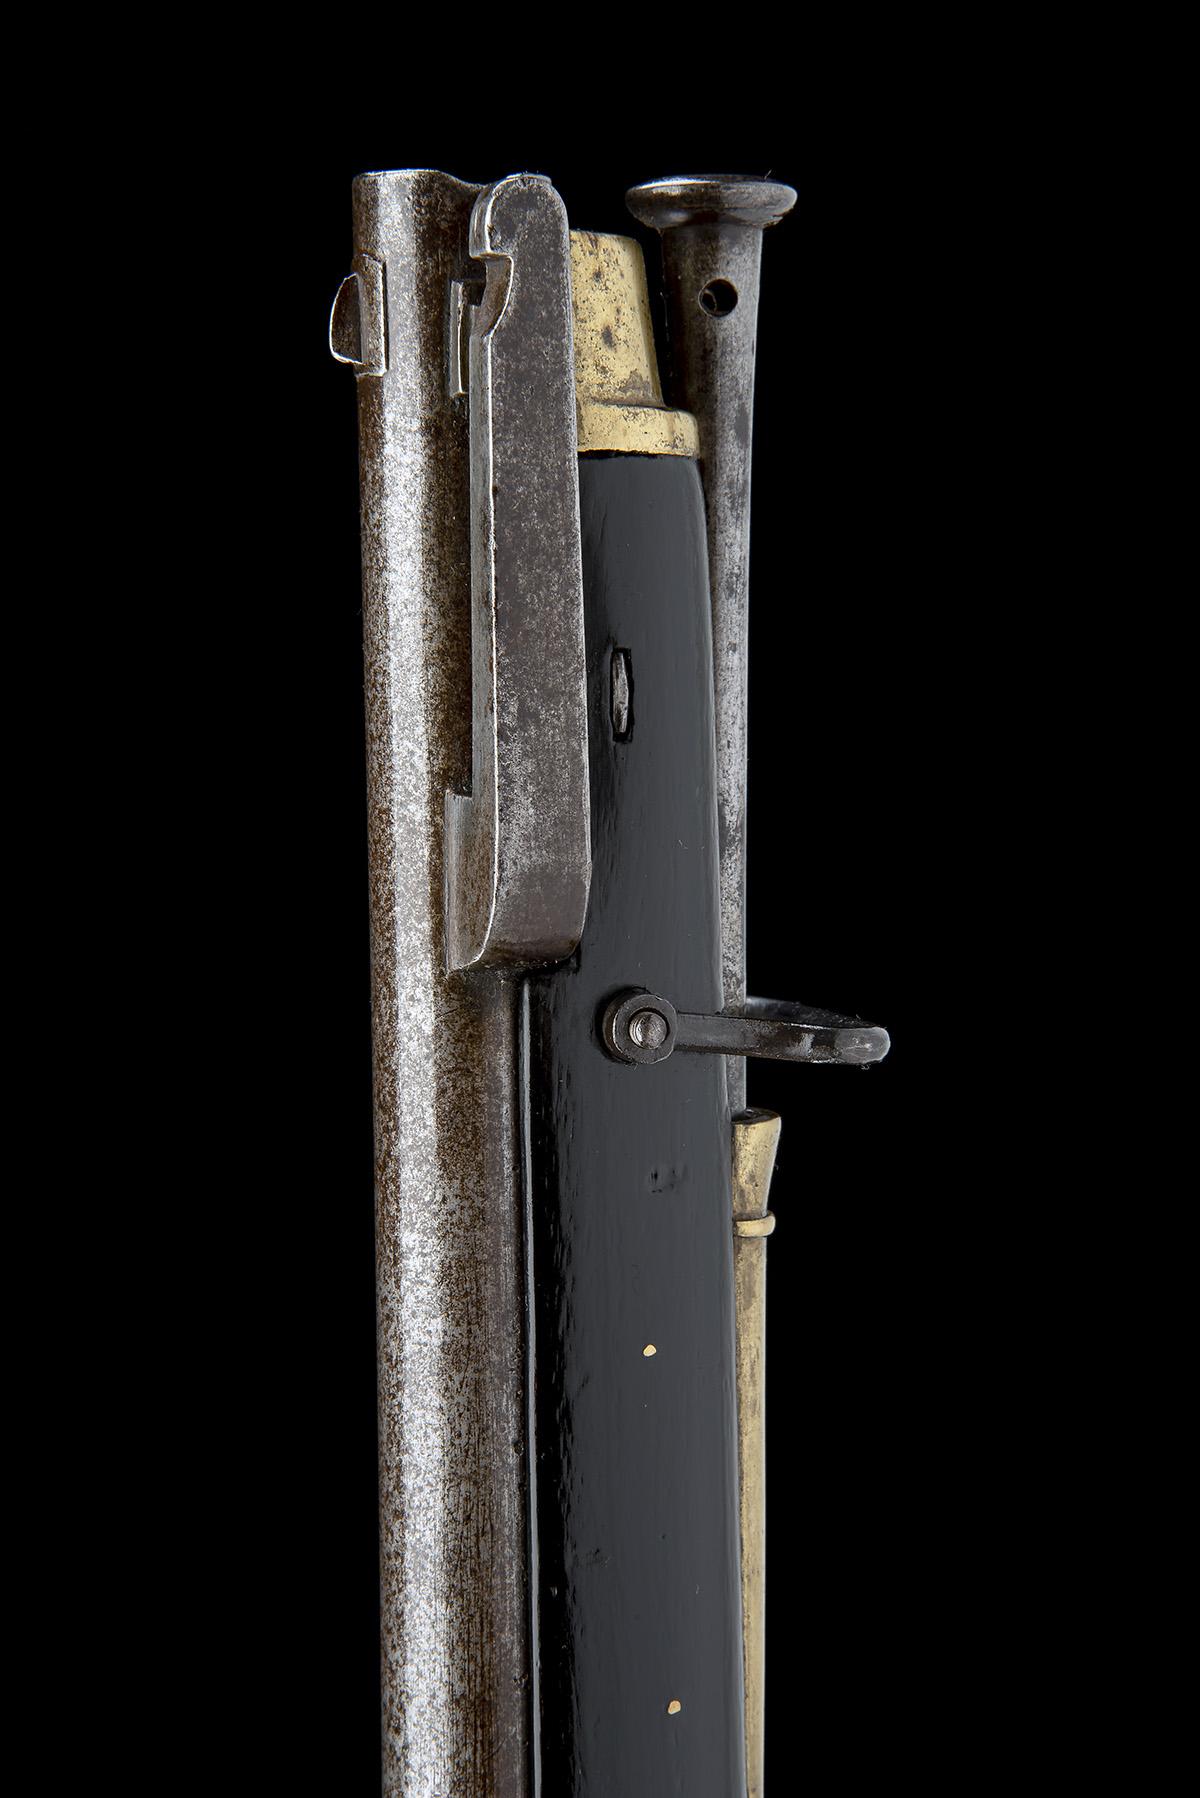 E.S. BAKER & SON, LONDON A .700 PERCUSSION SERVICE-RIFLE, MODEL 'EAST INDIA Co. MKII BRUNSWICK', - Image 6 of 8